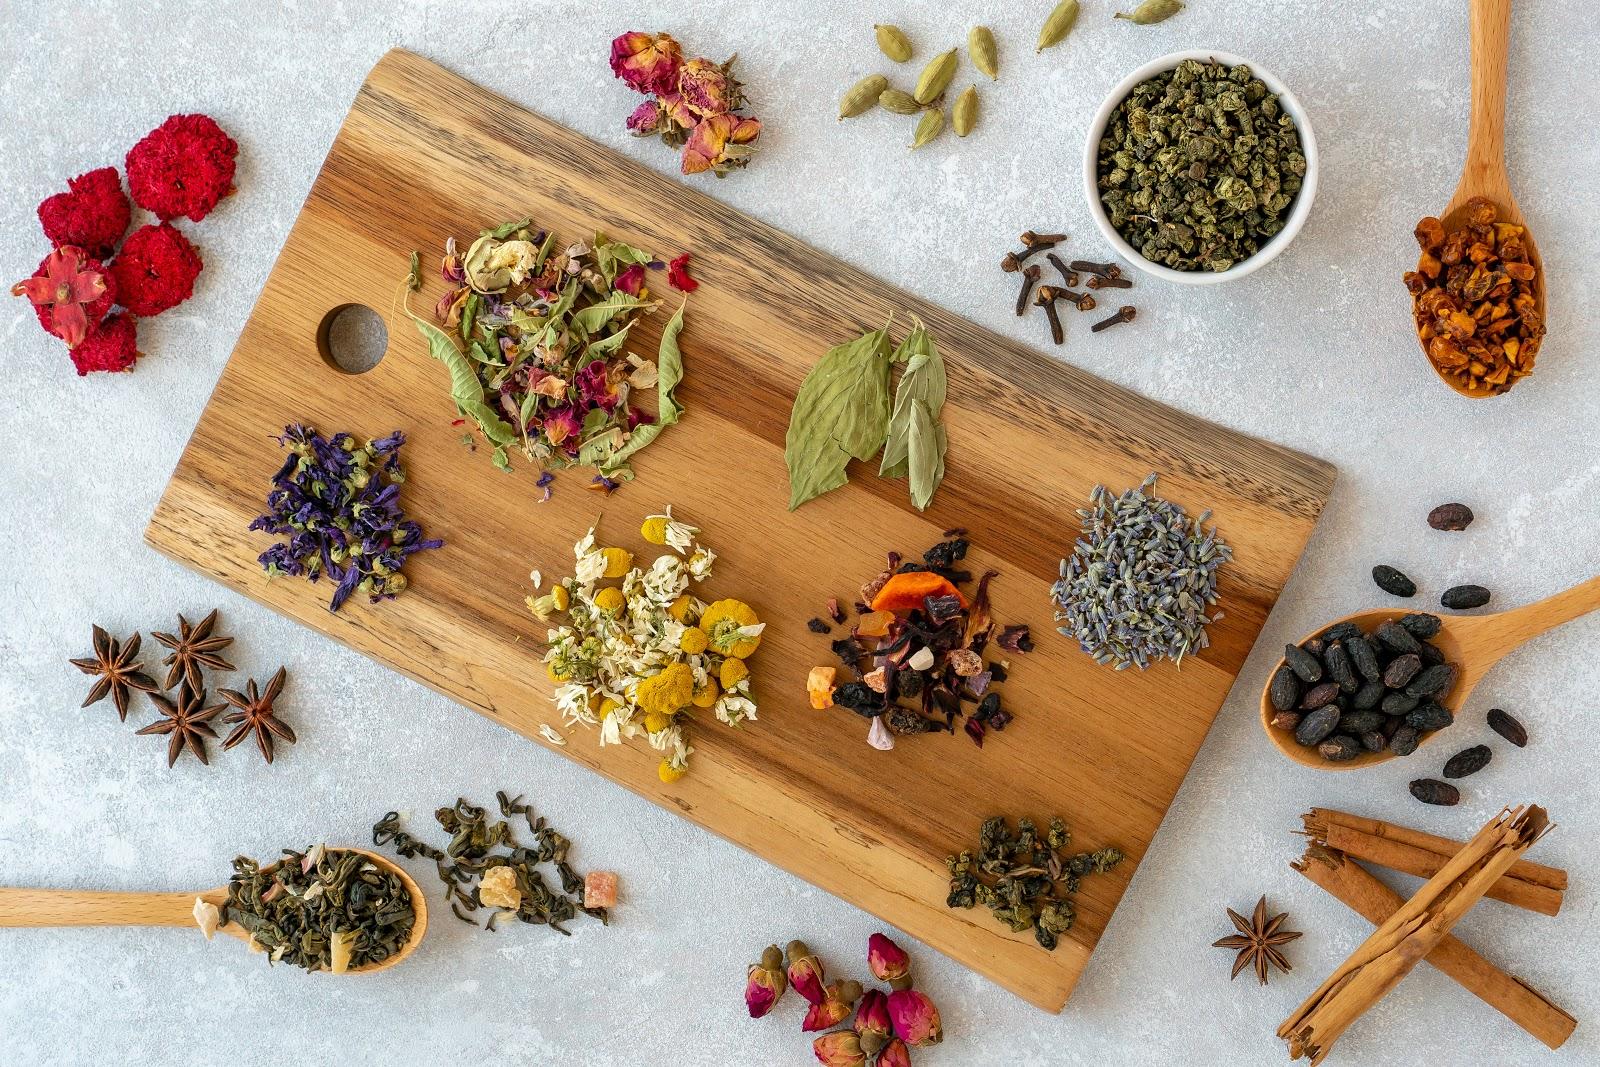 tea sampler on cutting board